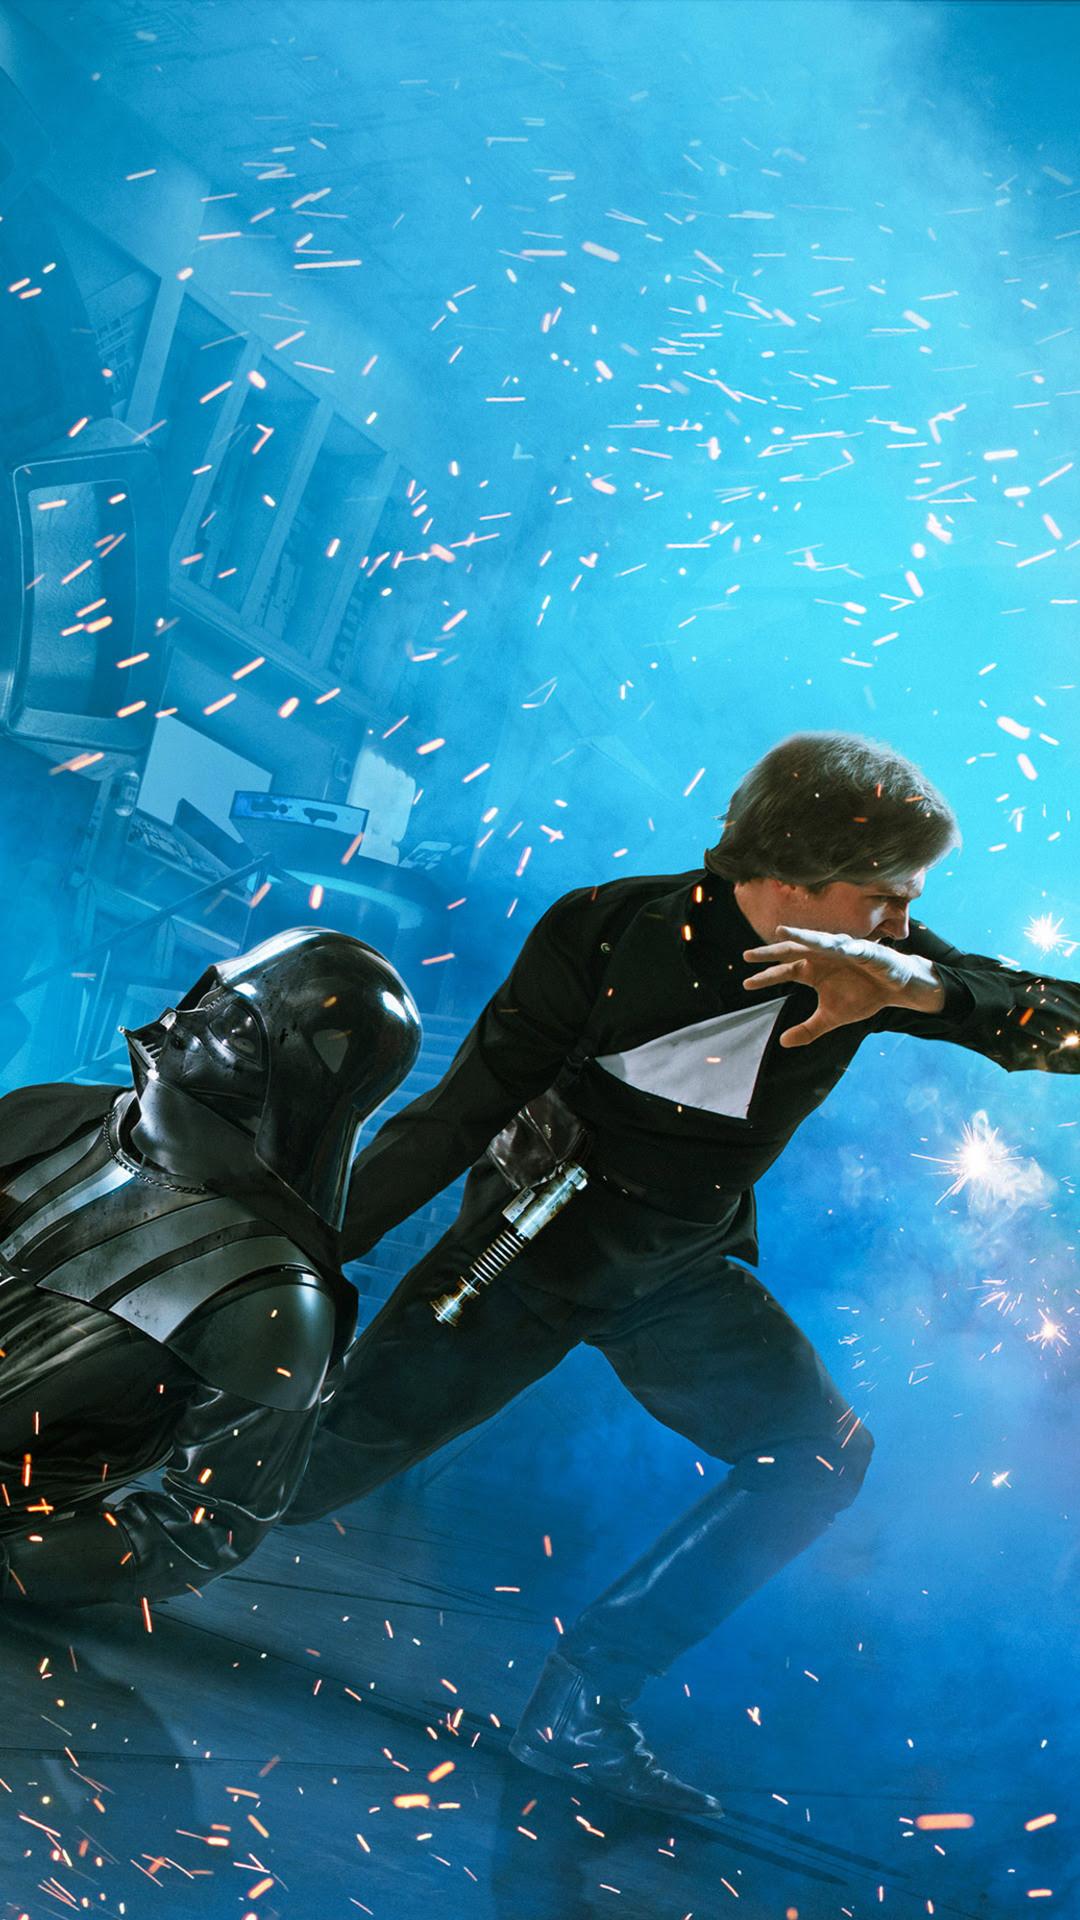 1080x1920 Star Wars Episode VI Return Of The Jedi Iphone 7 ...